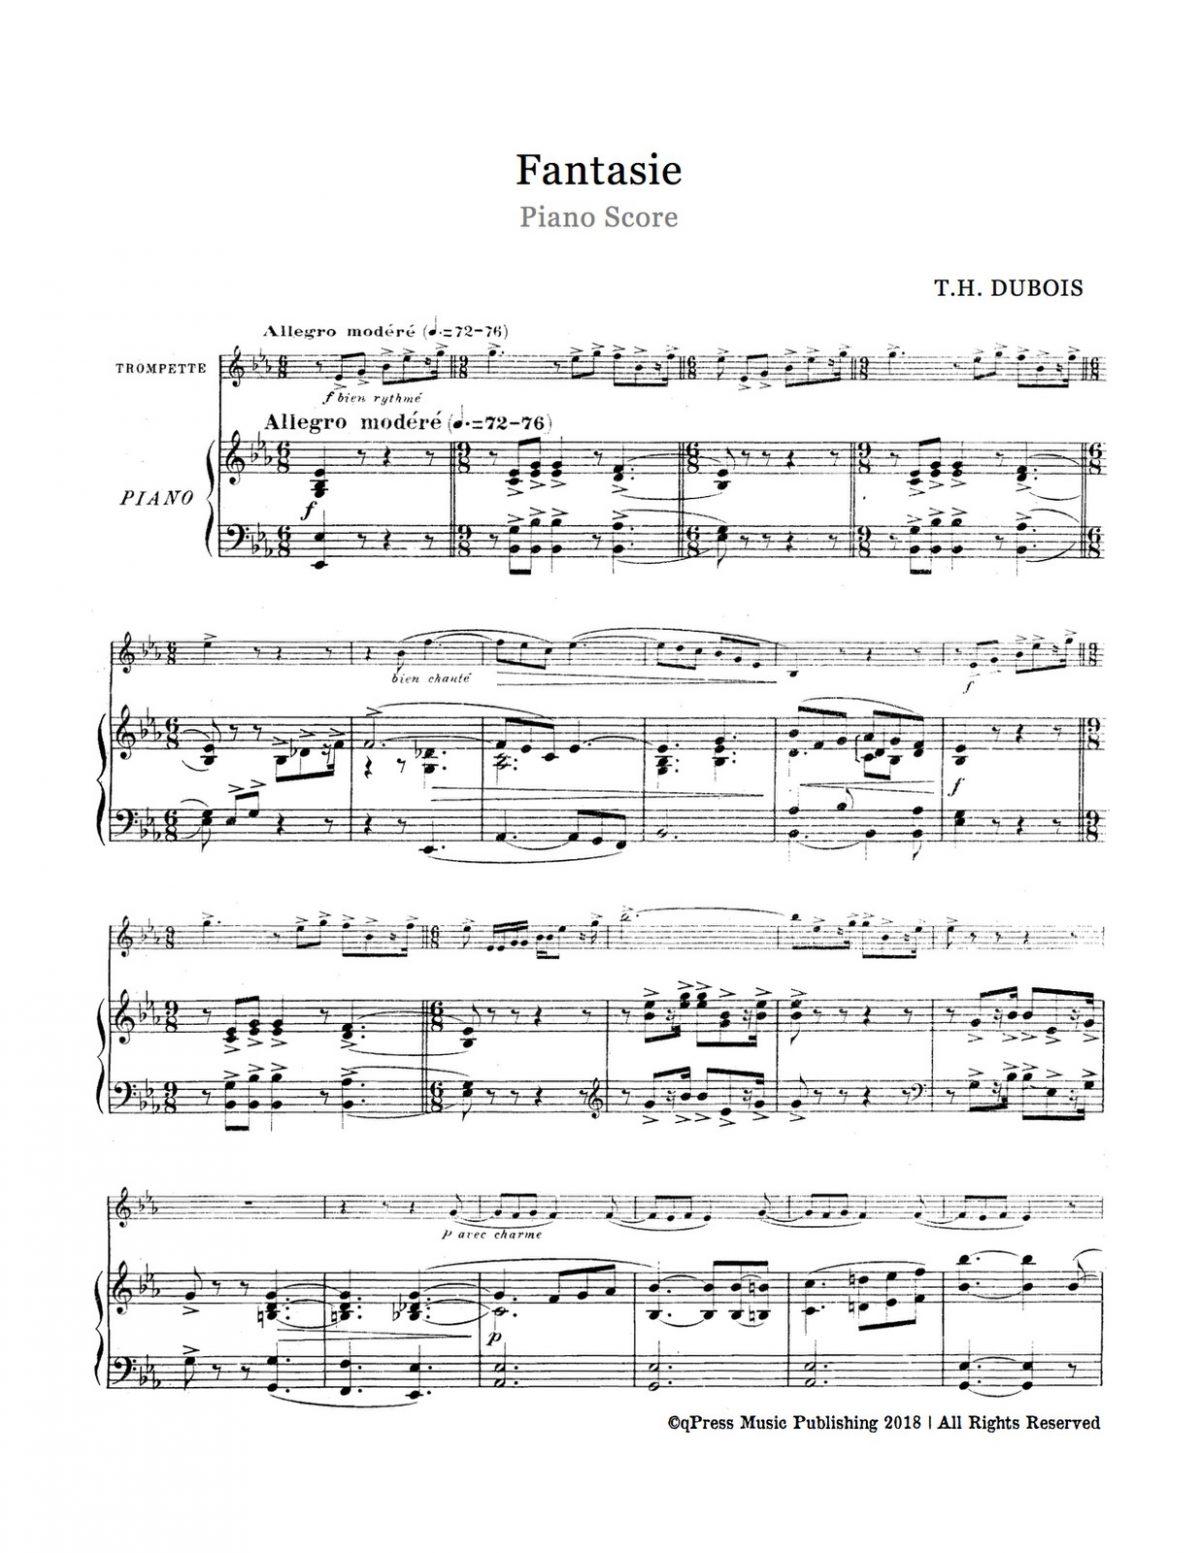 Dubois, Fantasie-p05